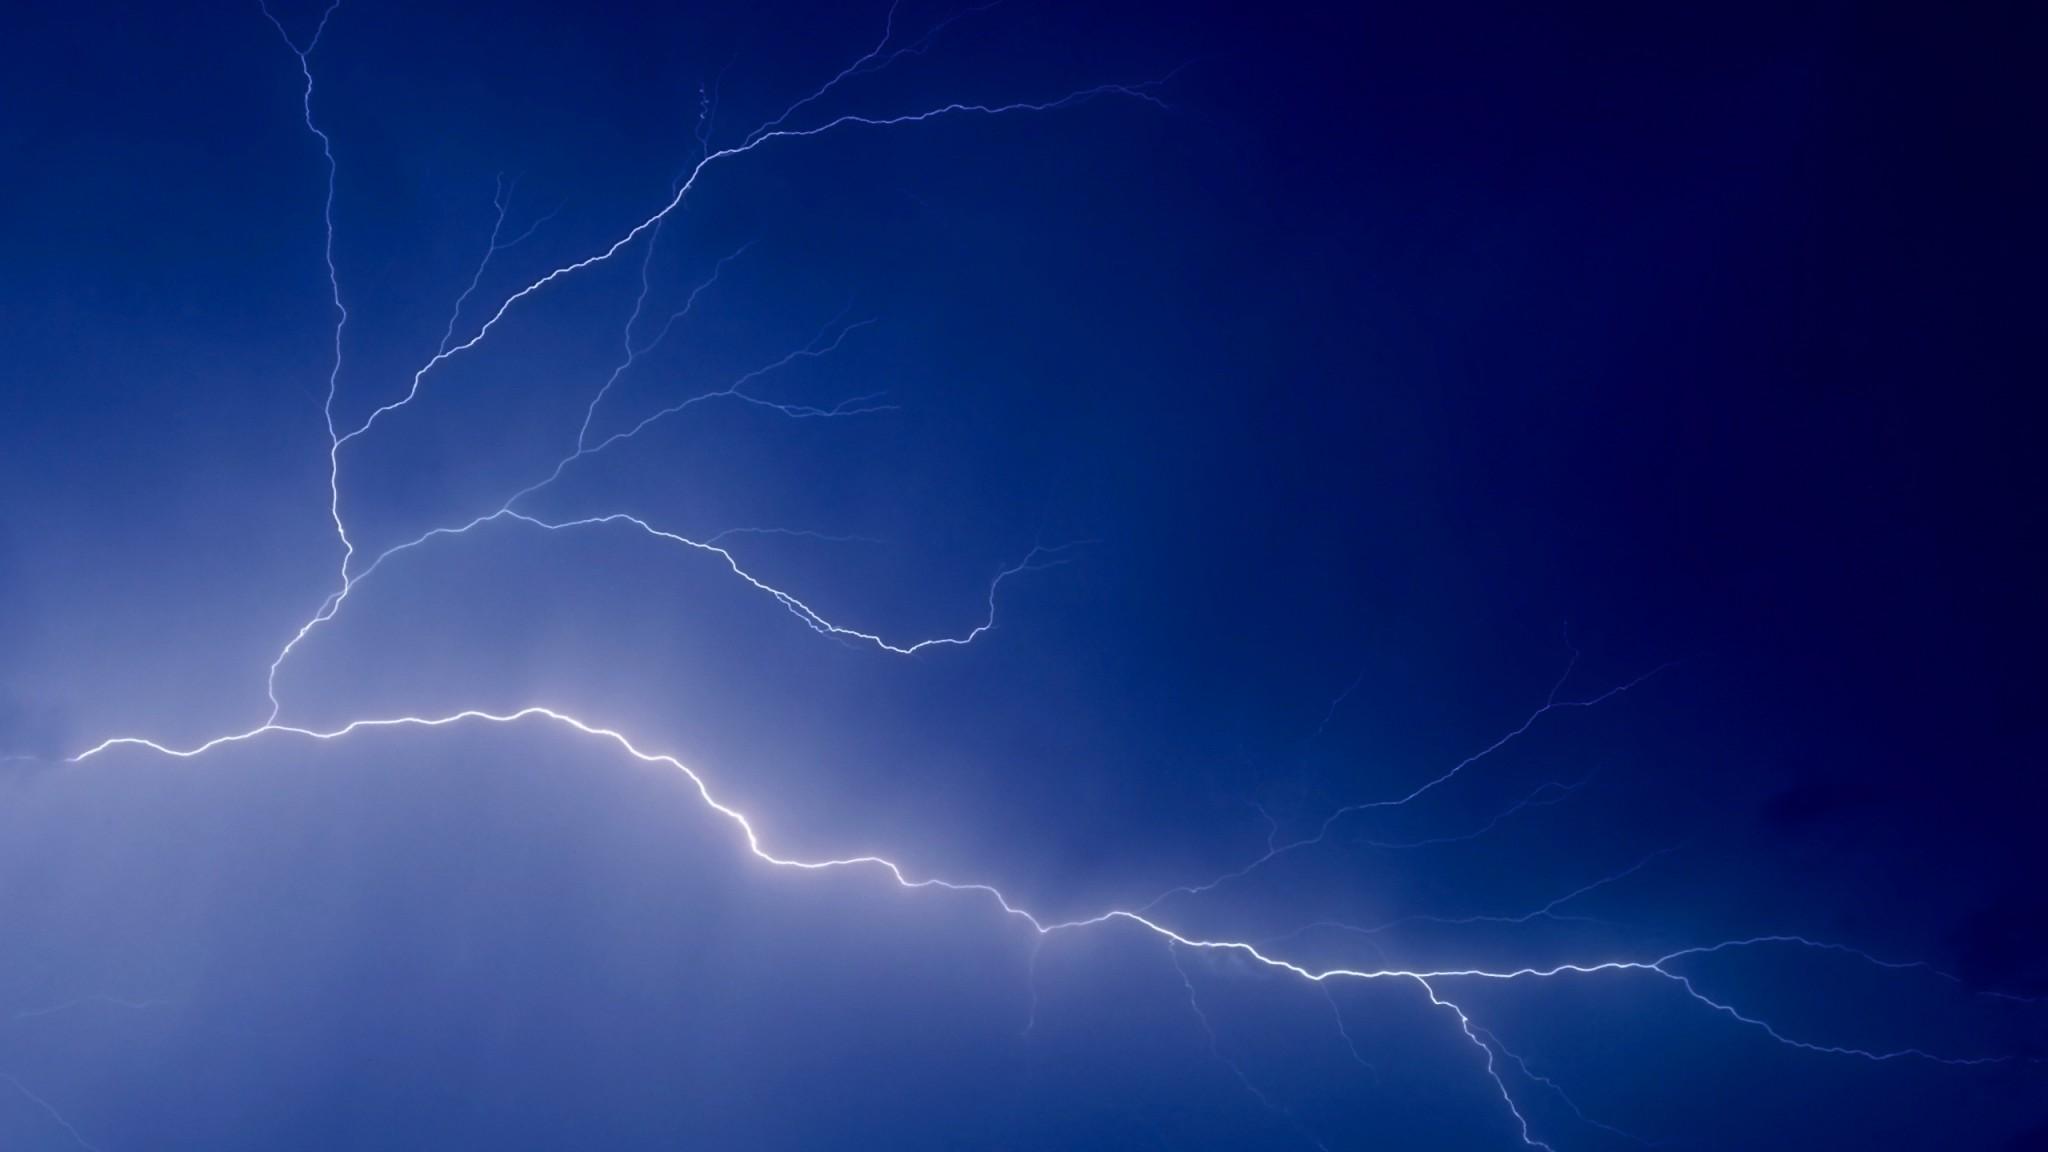 Wallpaper sky, lightning, peal, lines, dark blue, electricity